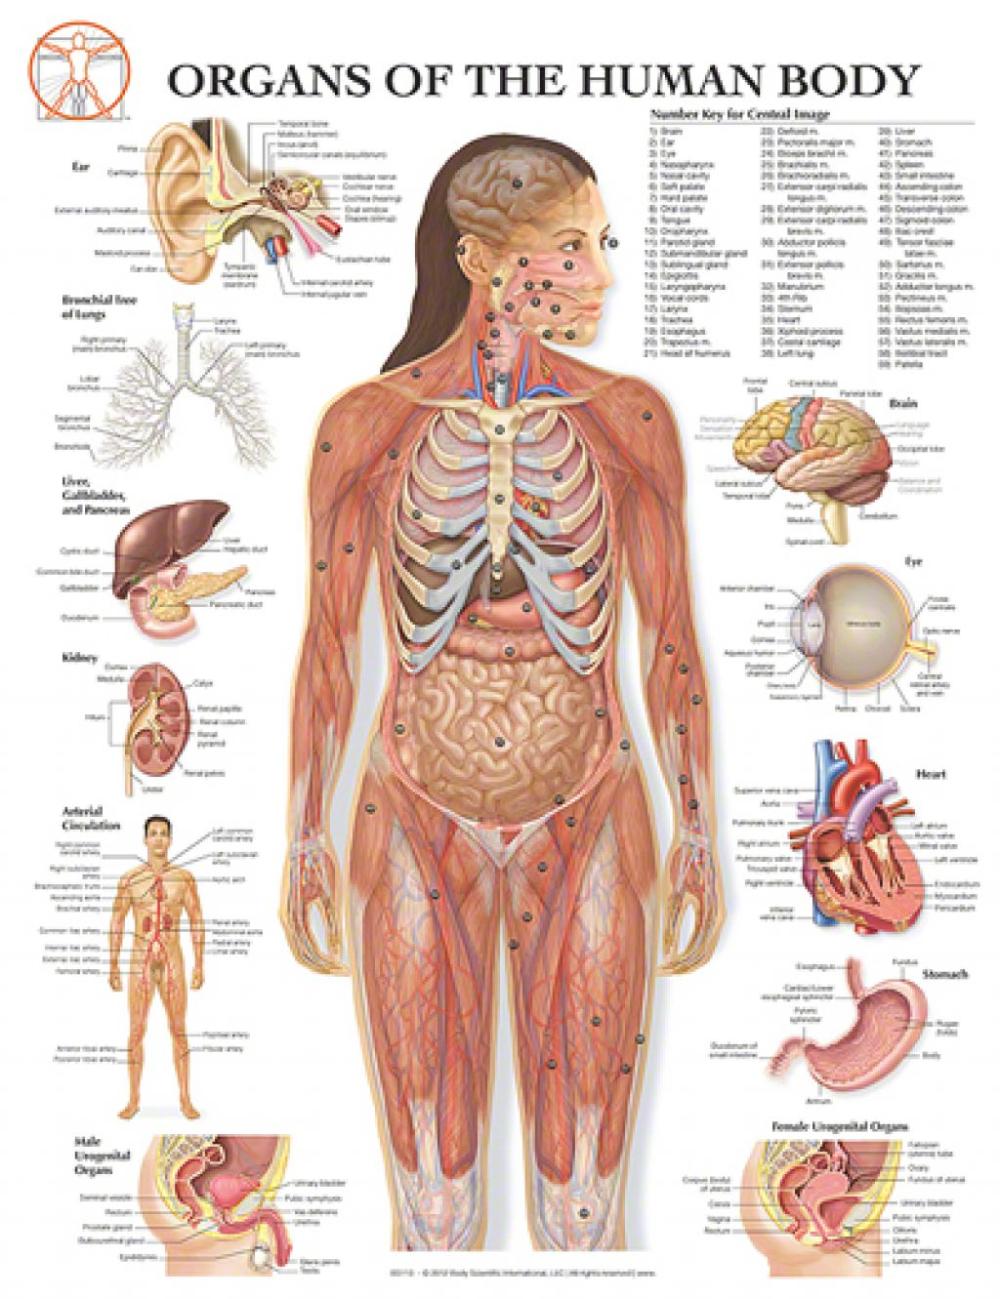 Human Body Diagram With Parts Human Anatomy Human Body Diagram Body Diagram Human Body Organs